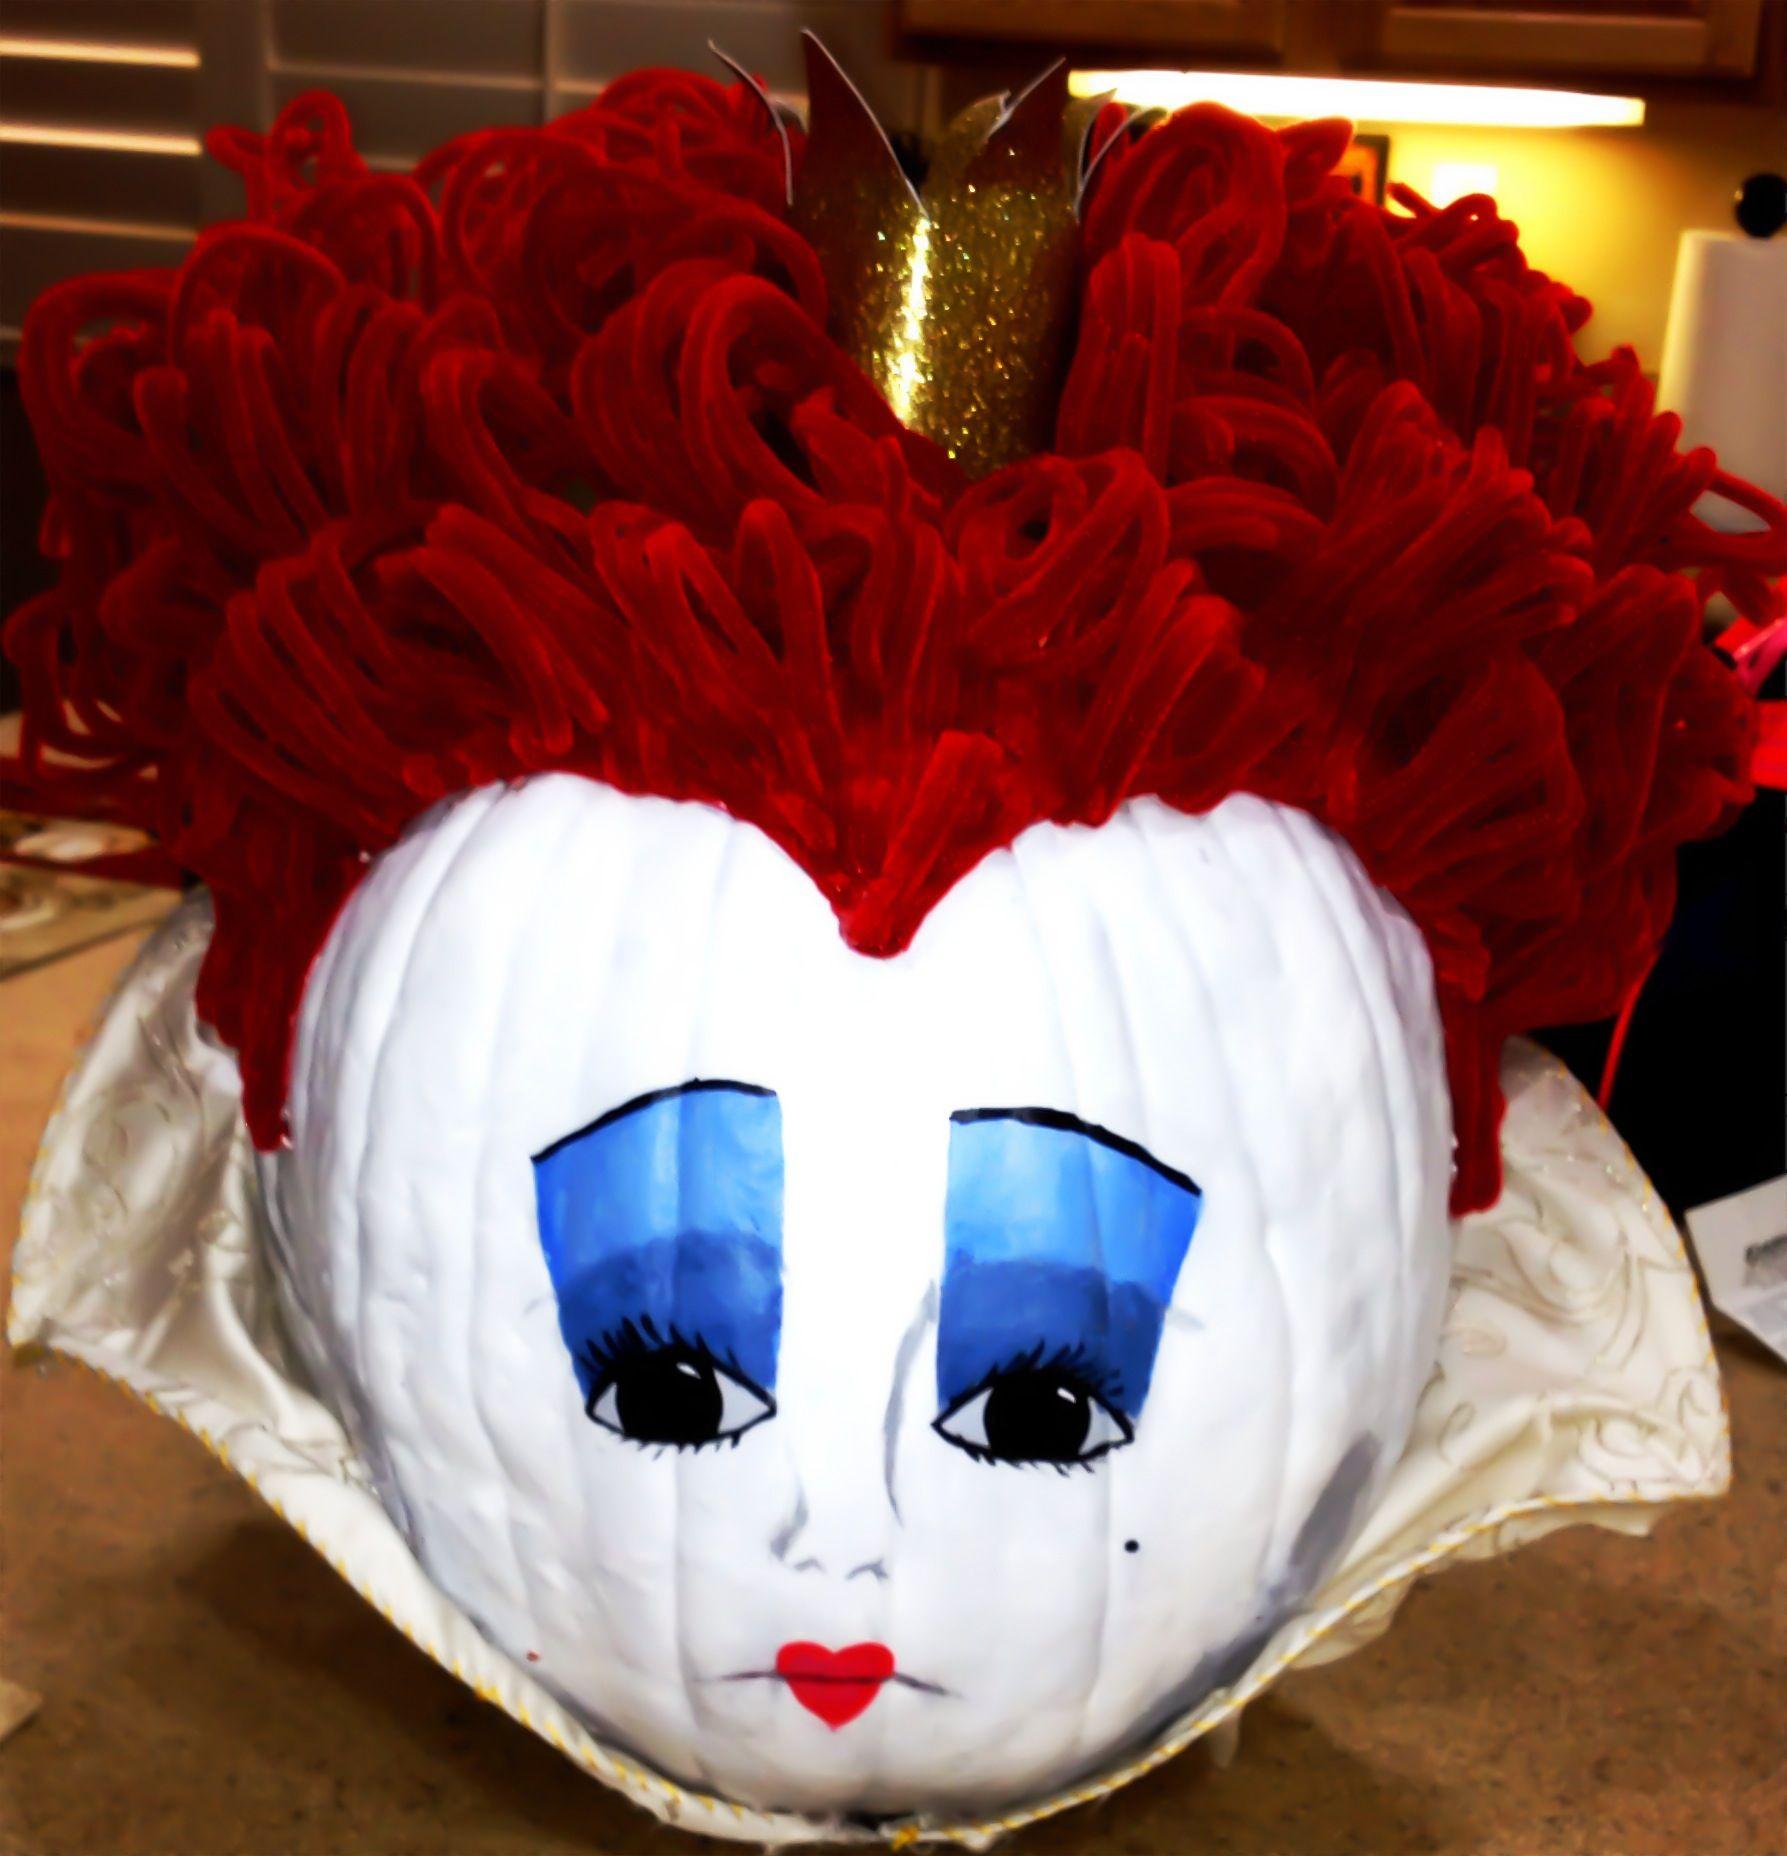 1st place winner pumpkin contest Queen of hearts